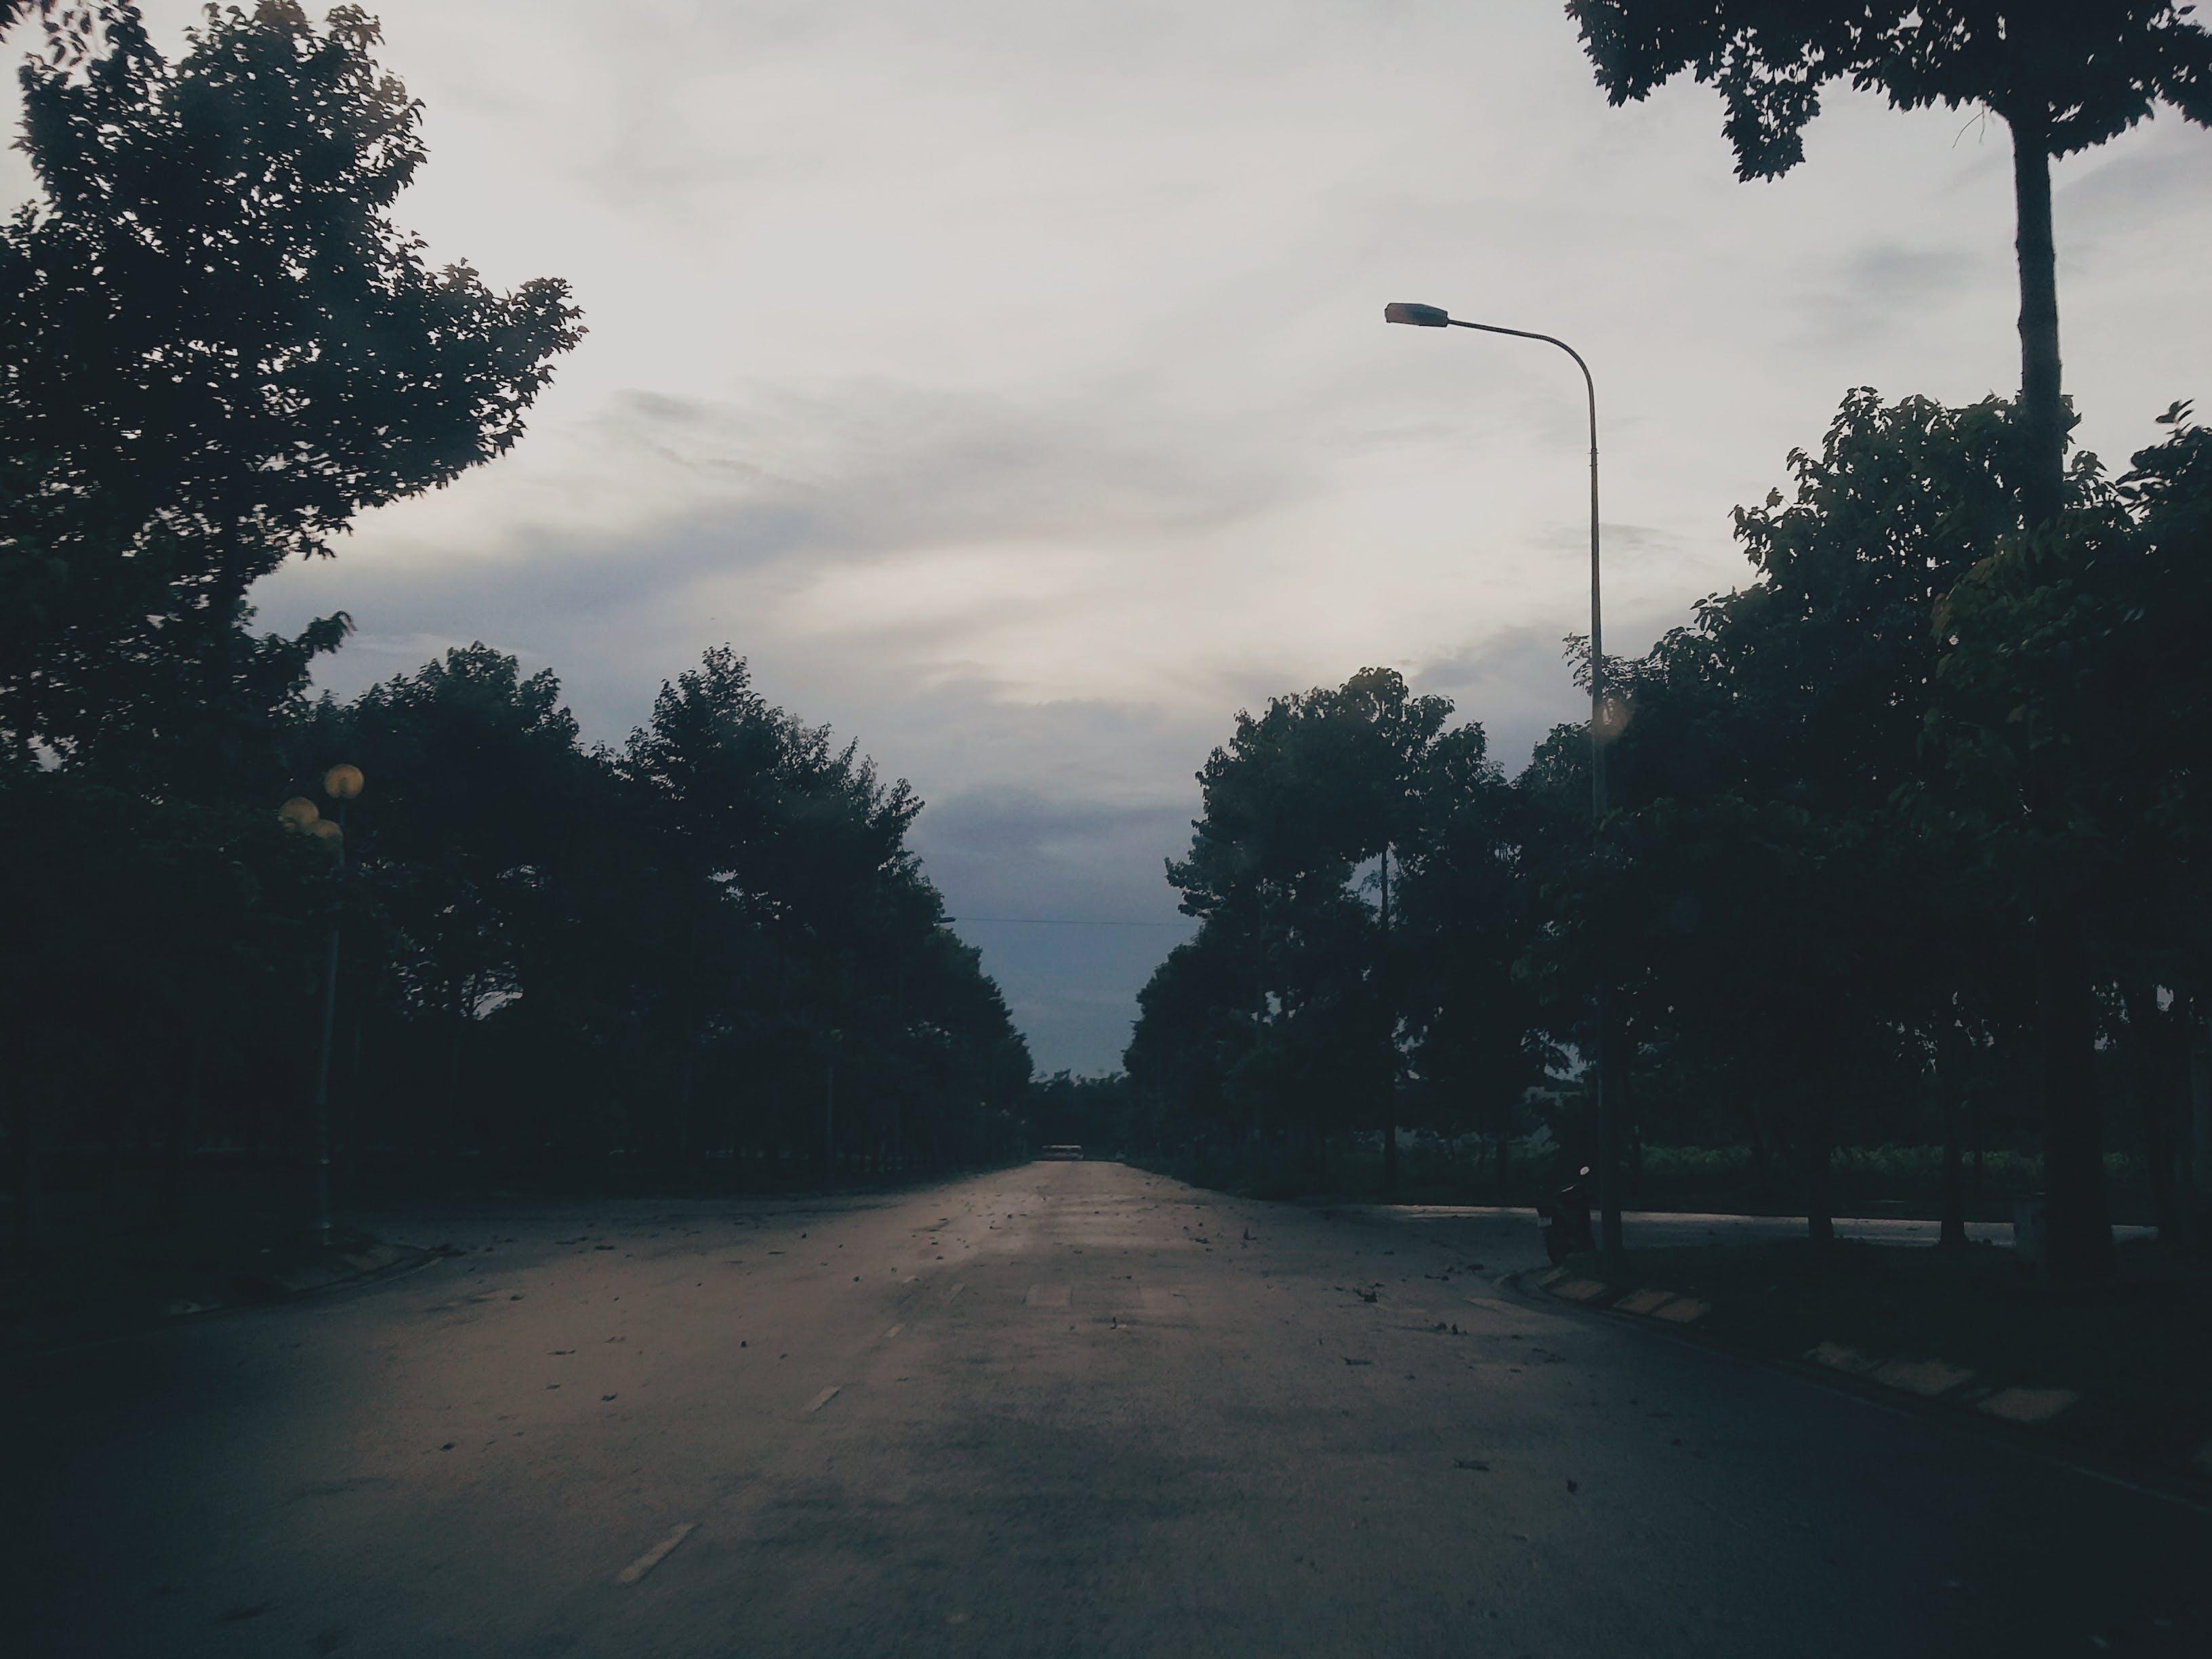 Free stock photo of #Darkness #Dark #Sad #Park, #street #Vietnam #VN, #Tree #Trees #LightPost #LampPost #SunSet #Sadness